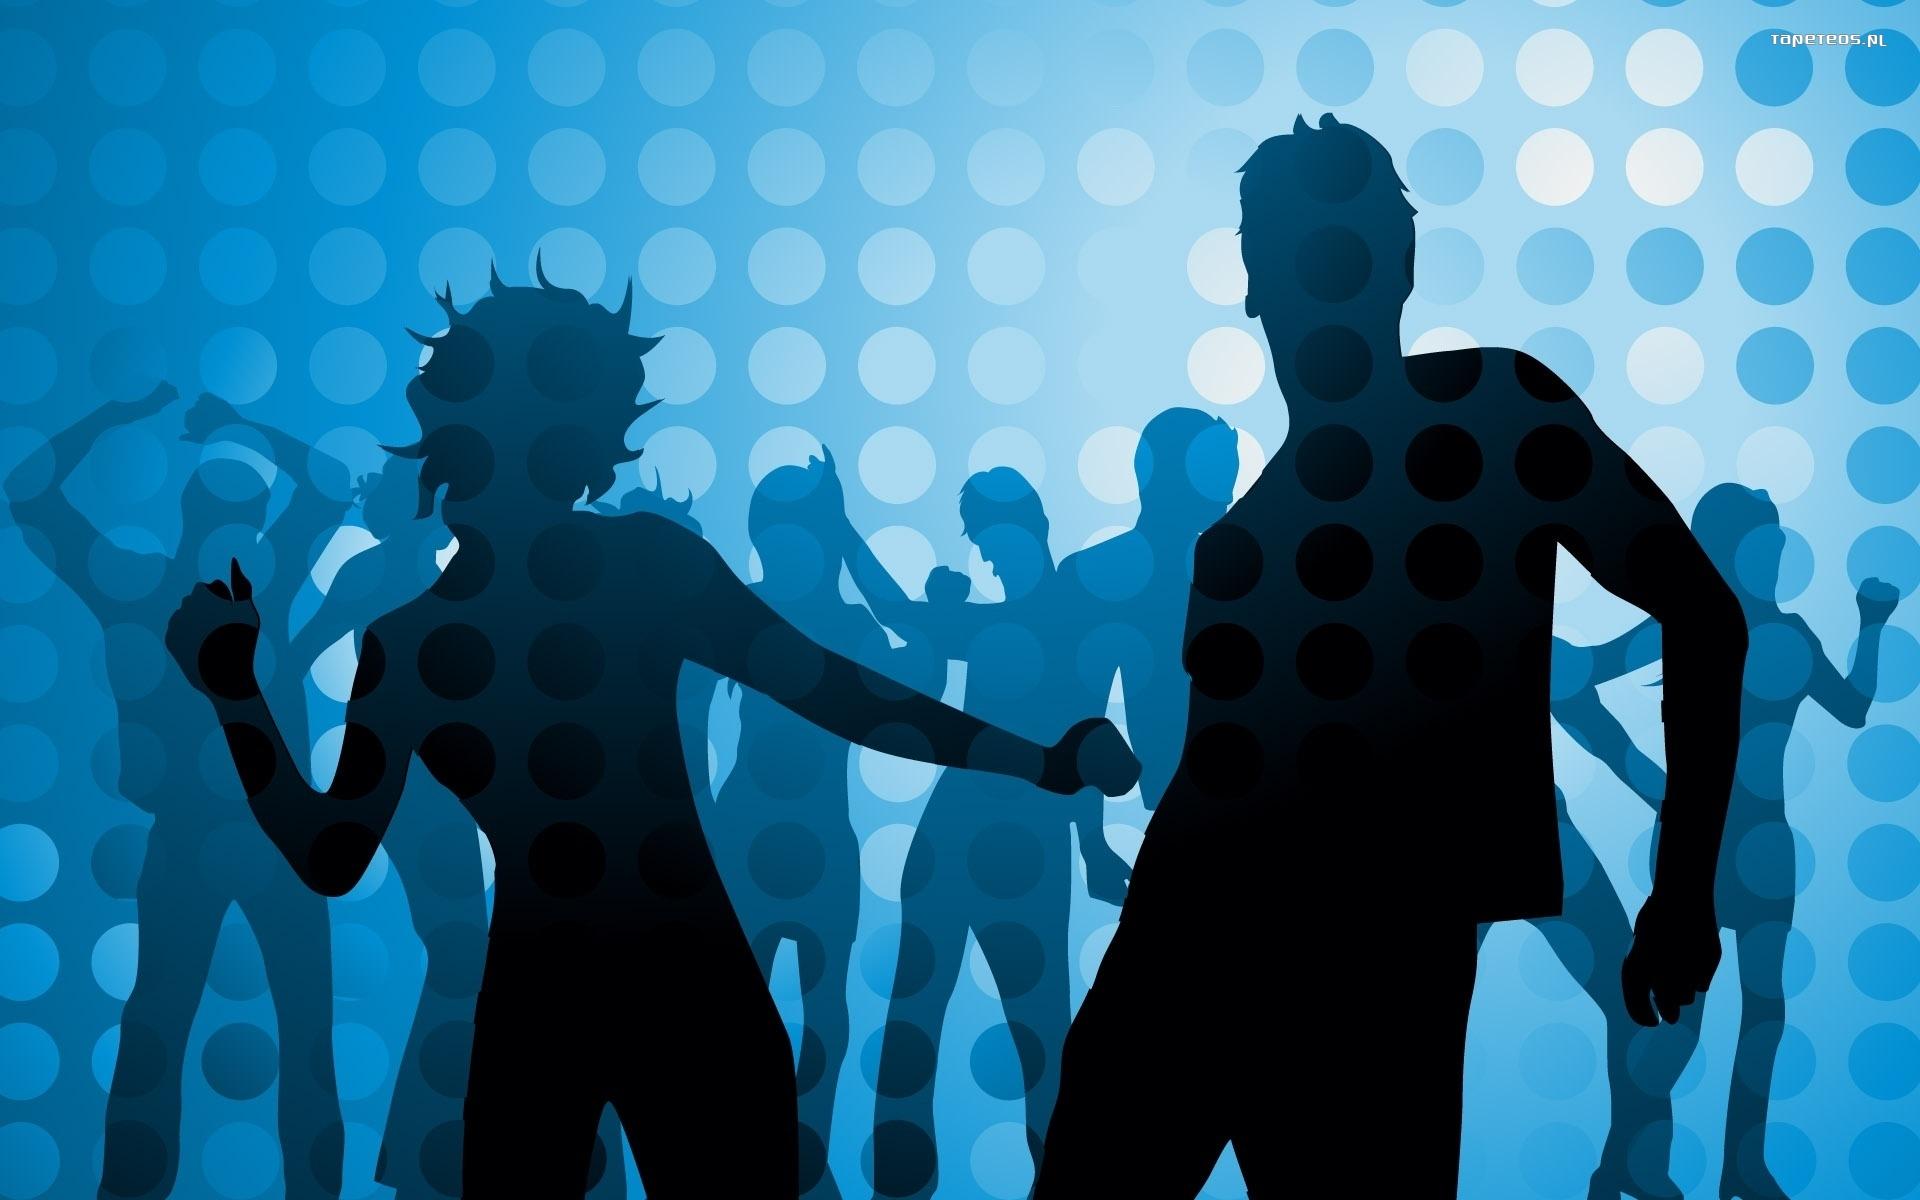 dancing club images -